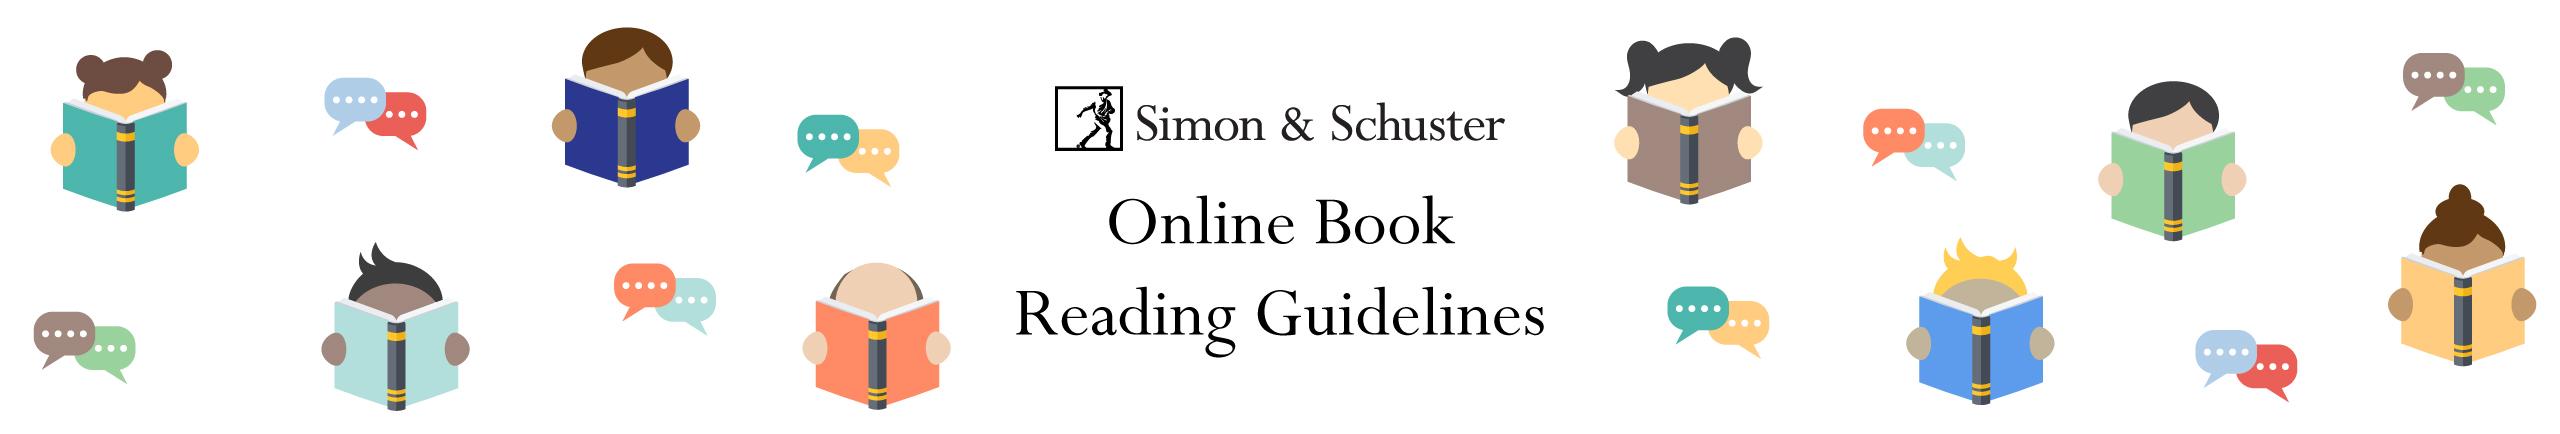 Simon & Schuster Online Read-Aloud Guidelines